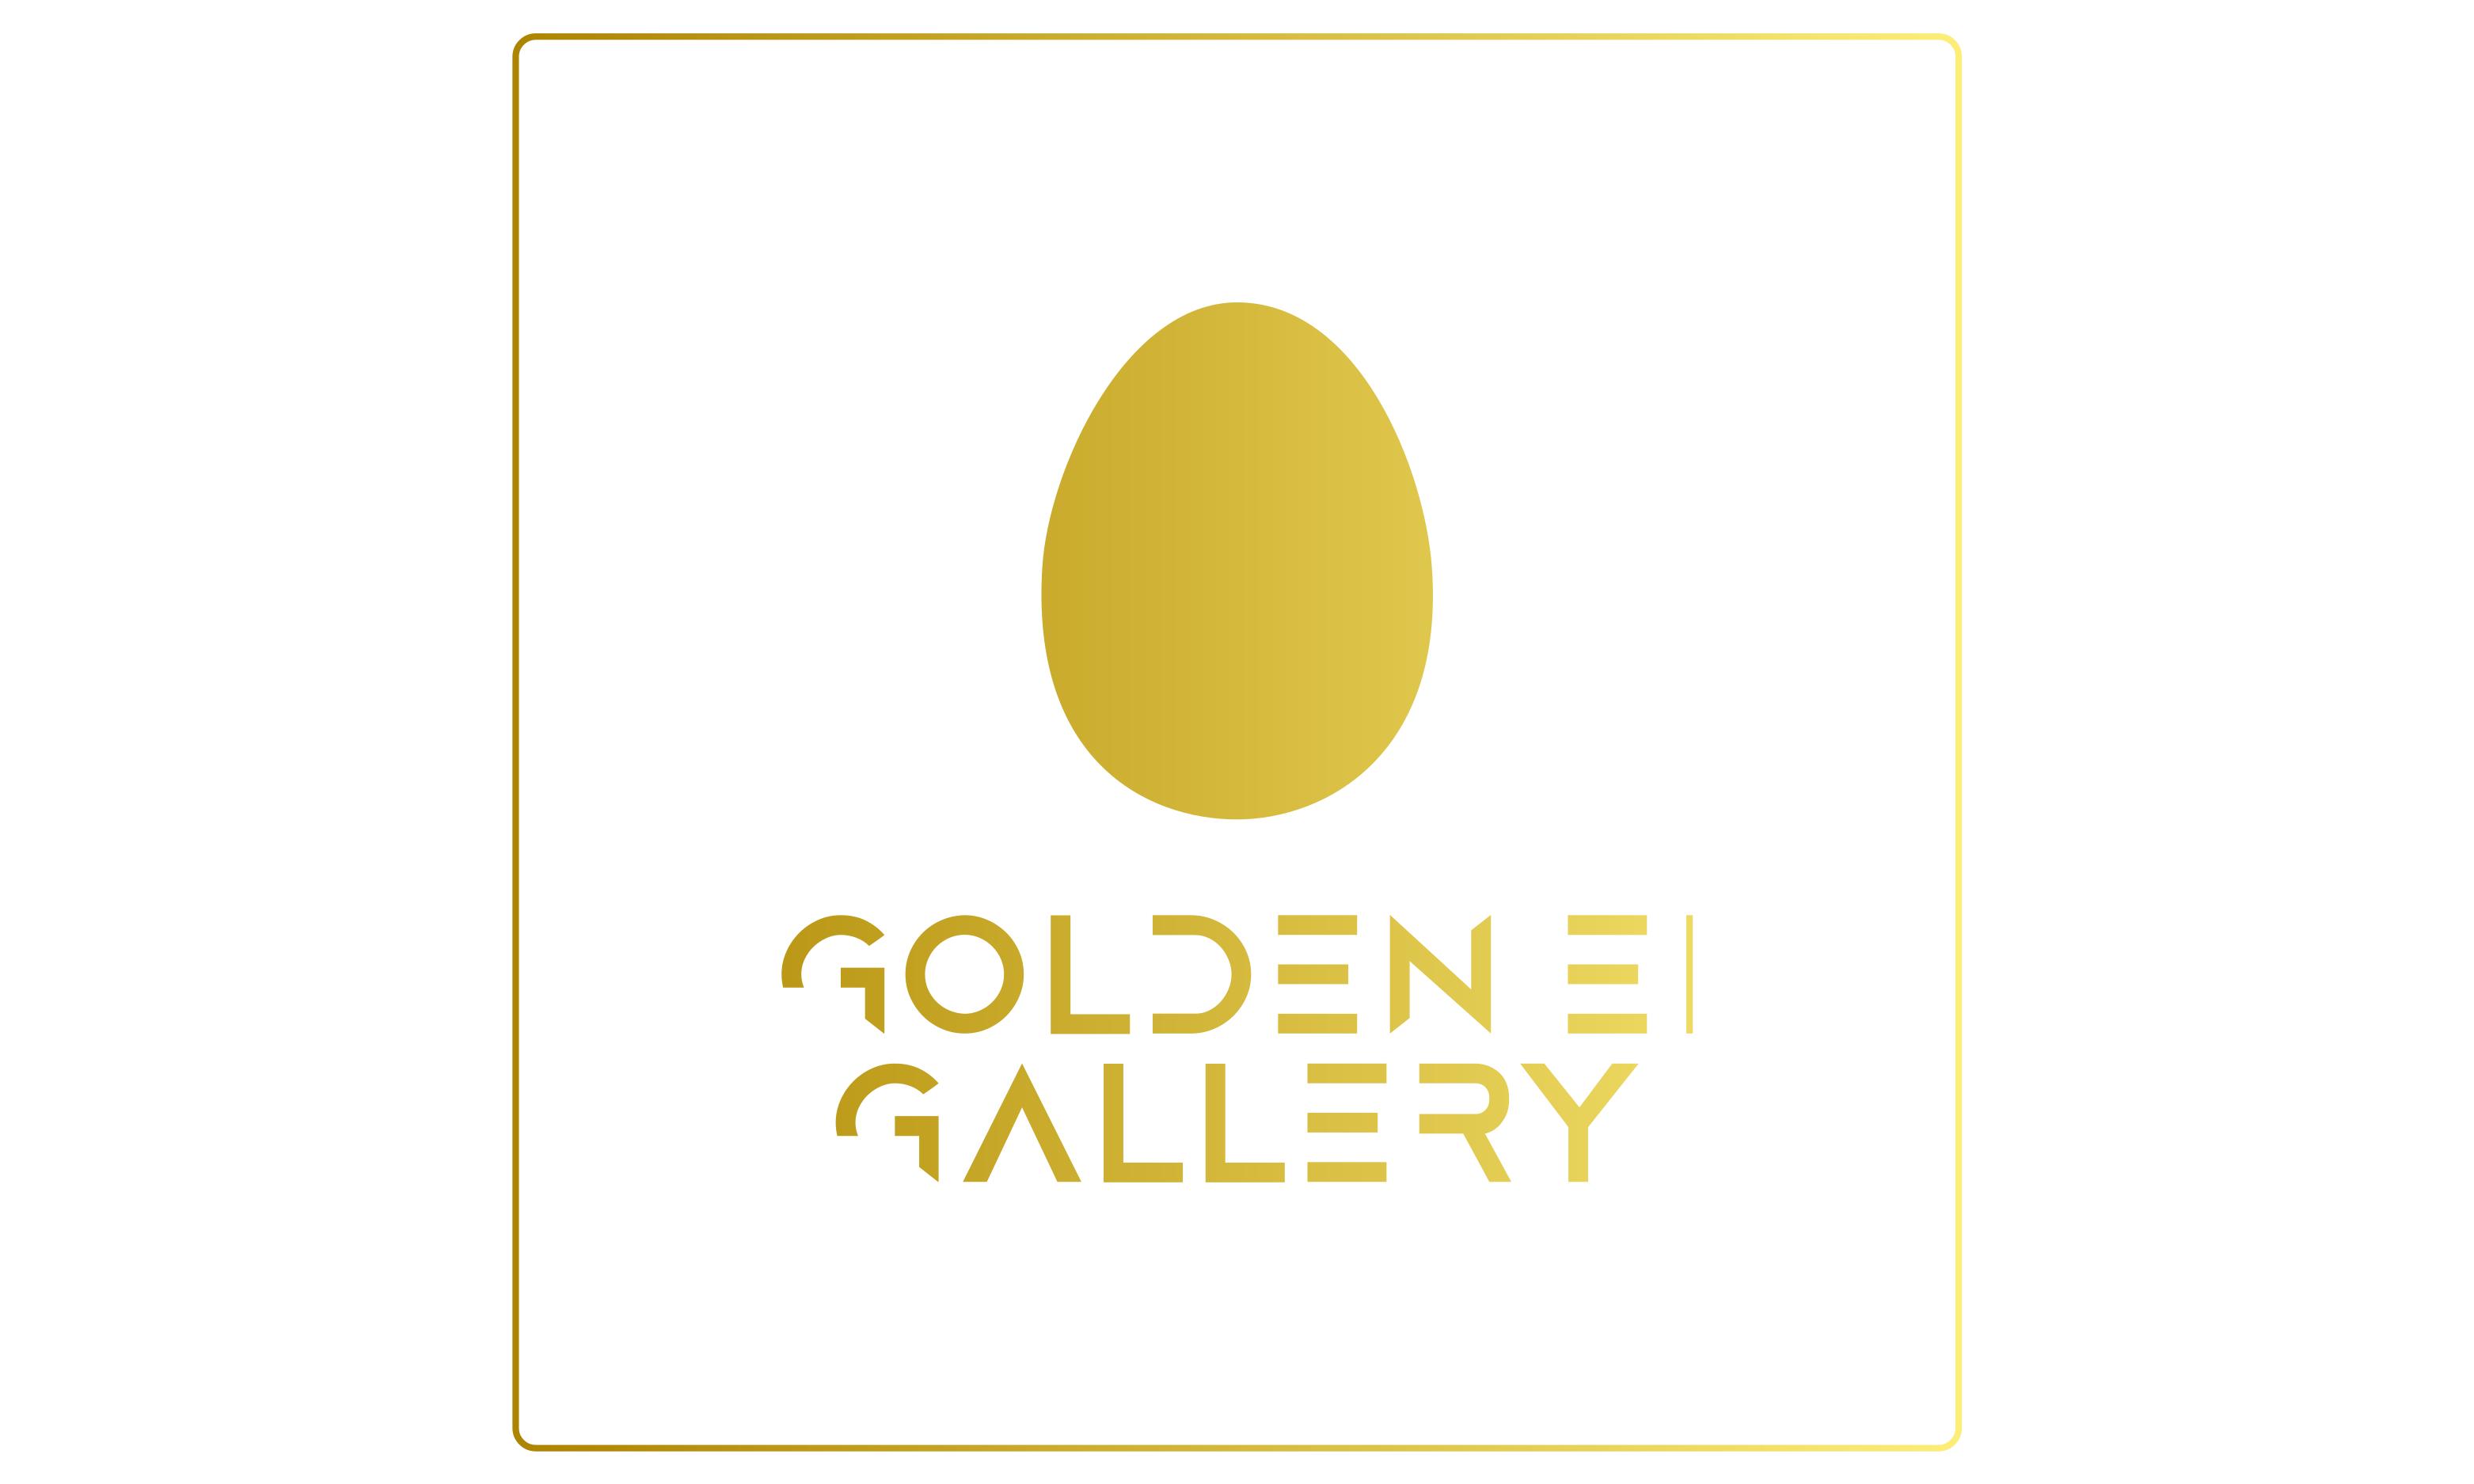 goldeneigallery.de